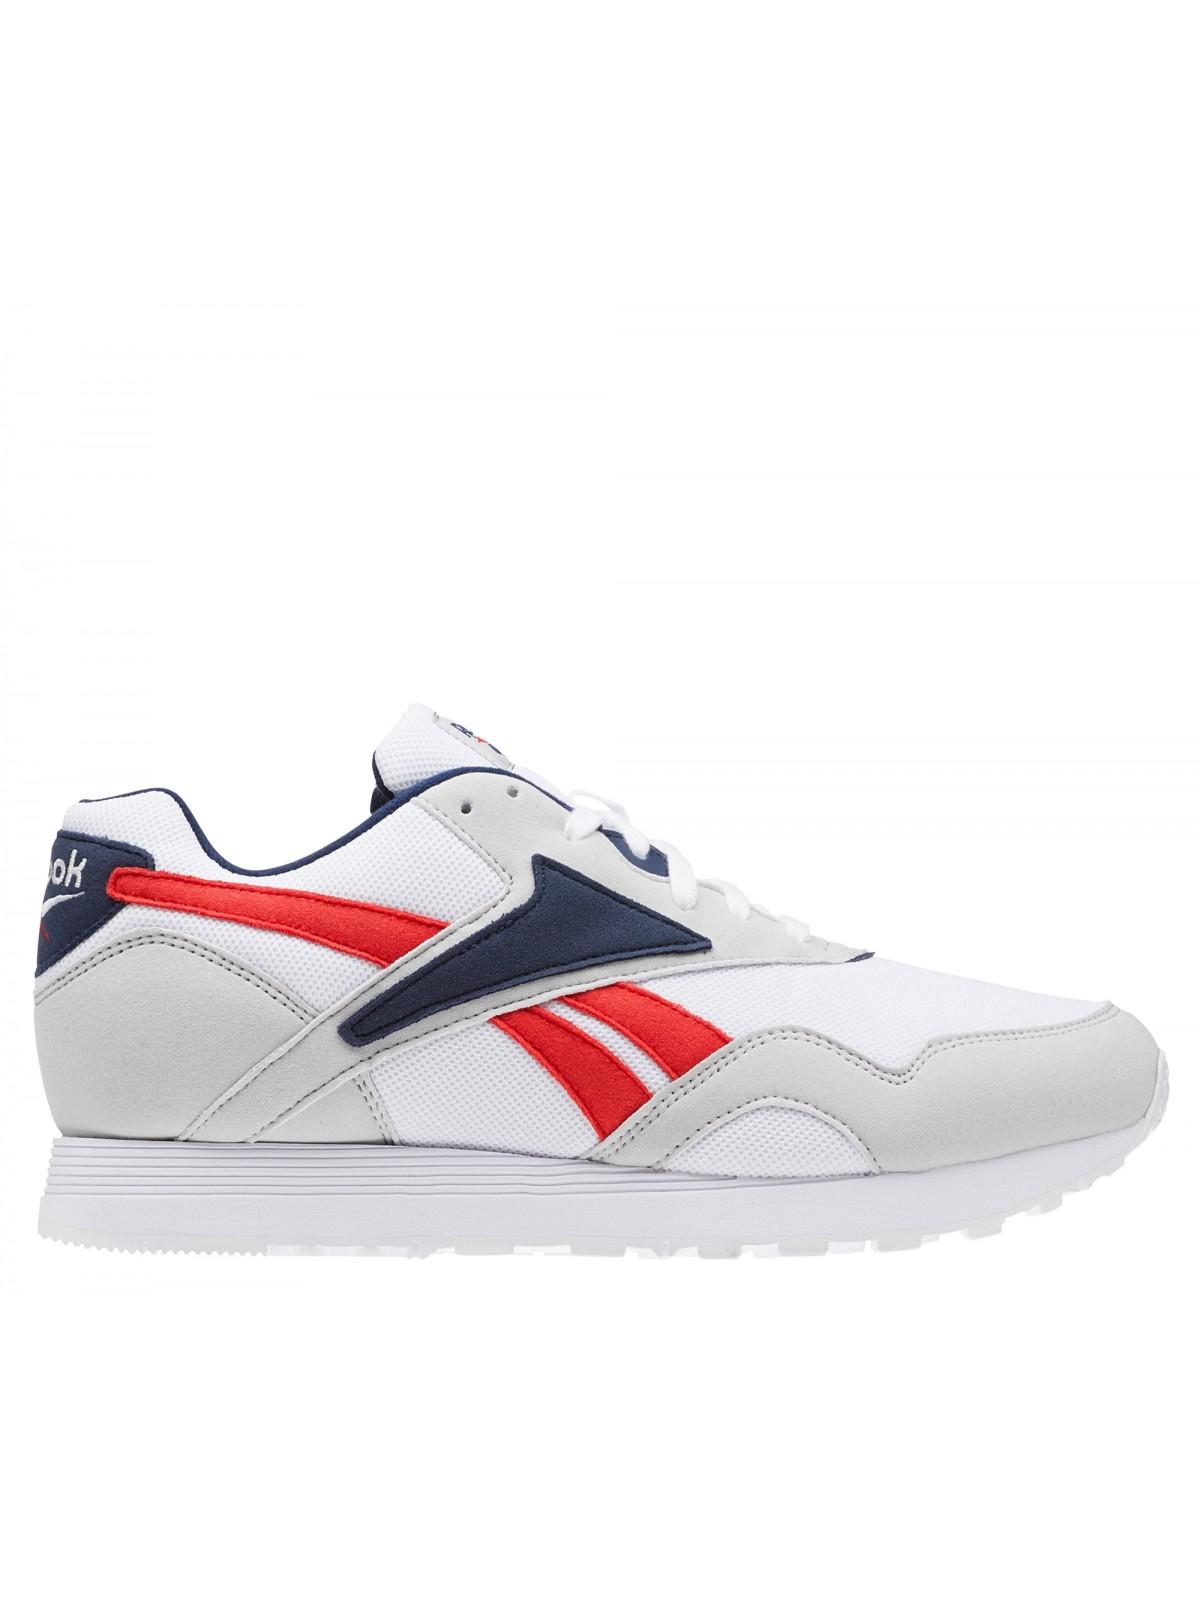 REEBOK Rapide bleu / blanc / rouge